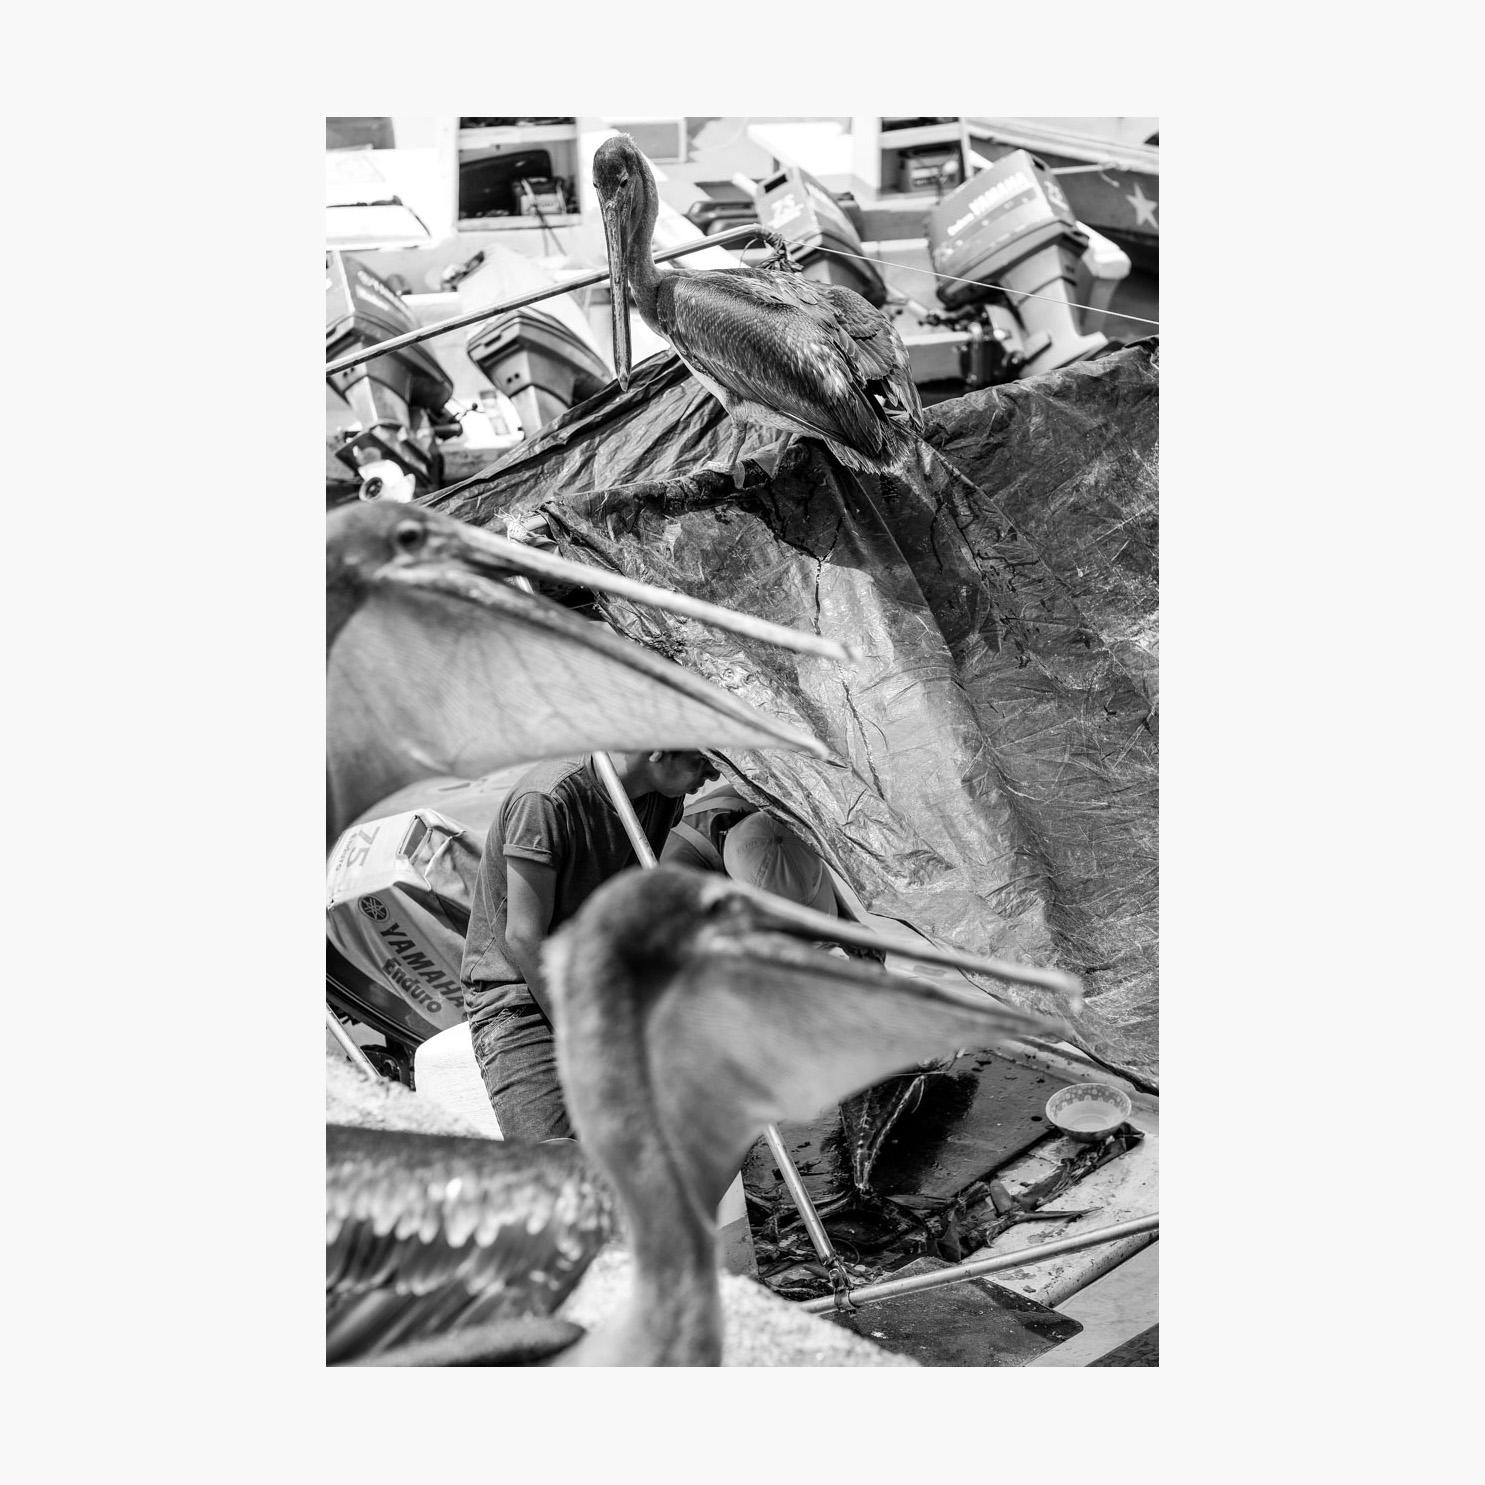 ©-2018-Harry-W-Edmonds-London-Photographers-Note-11-The-Fishermen-PN01.jpg